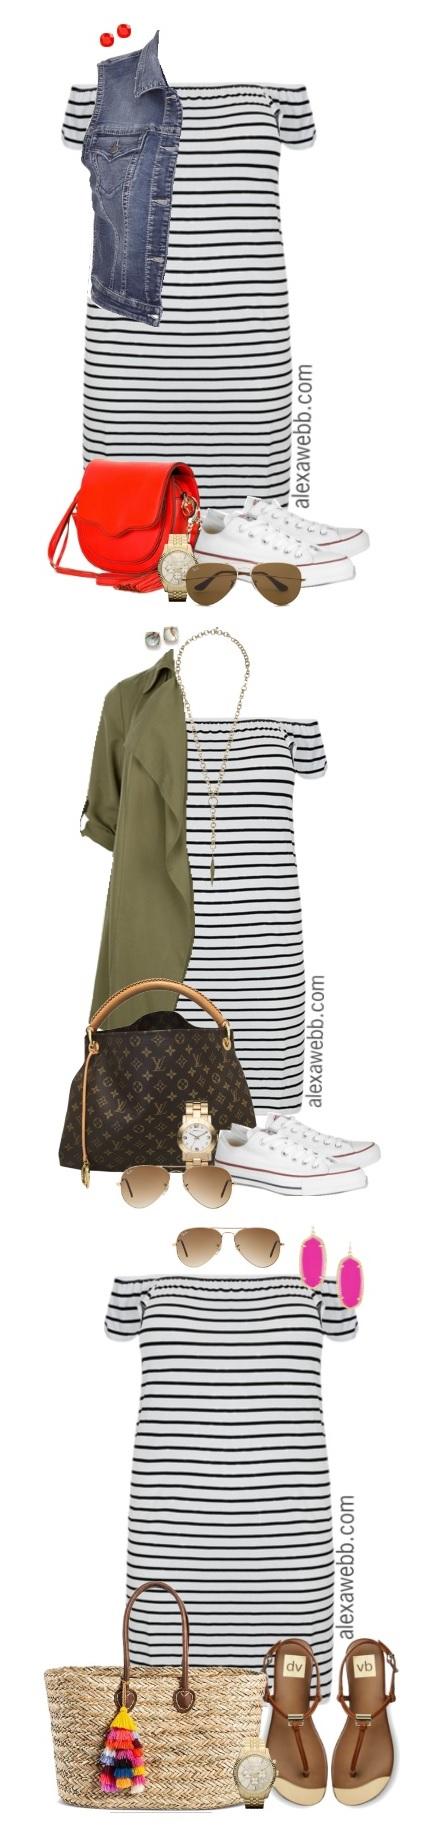 19e01cdecfd5 Plus Size Striped Dress Outfits - Plus Size Fashion - alexawebb.com